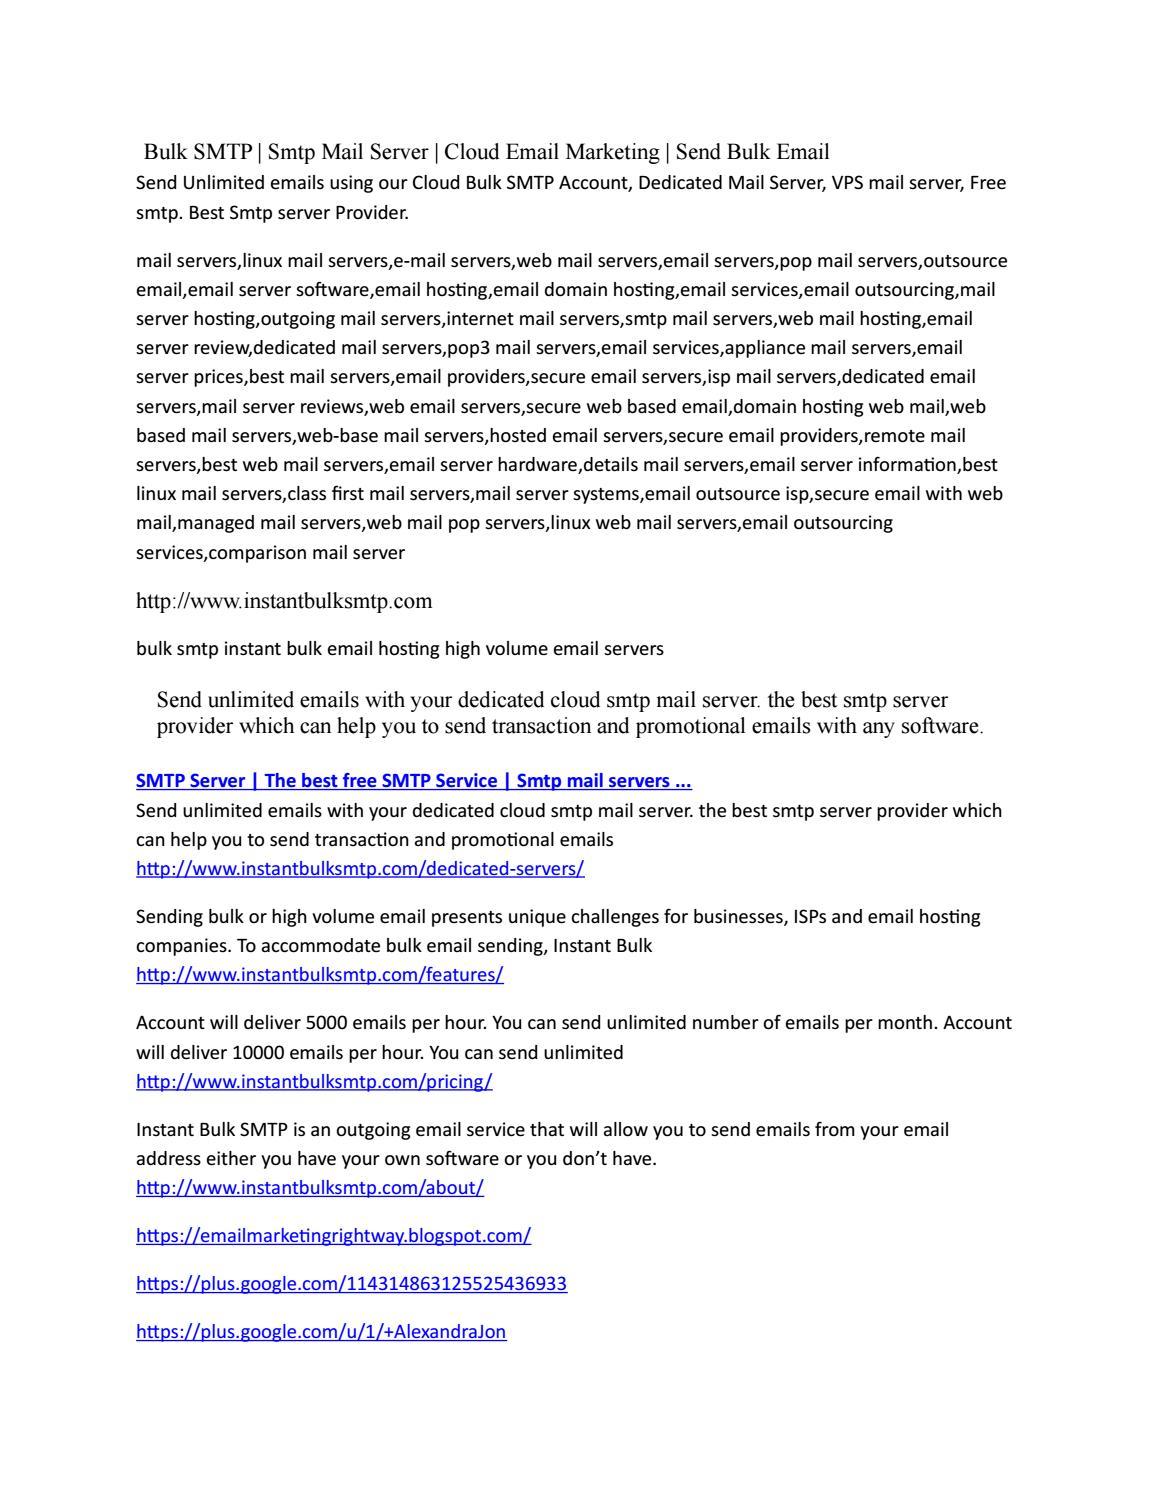 Bulk SMTP | Dedicated Mail Server | Email Marketing | Send Bulk